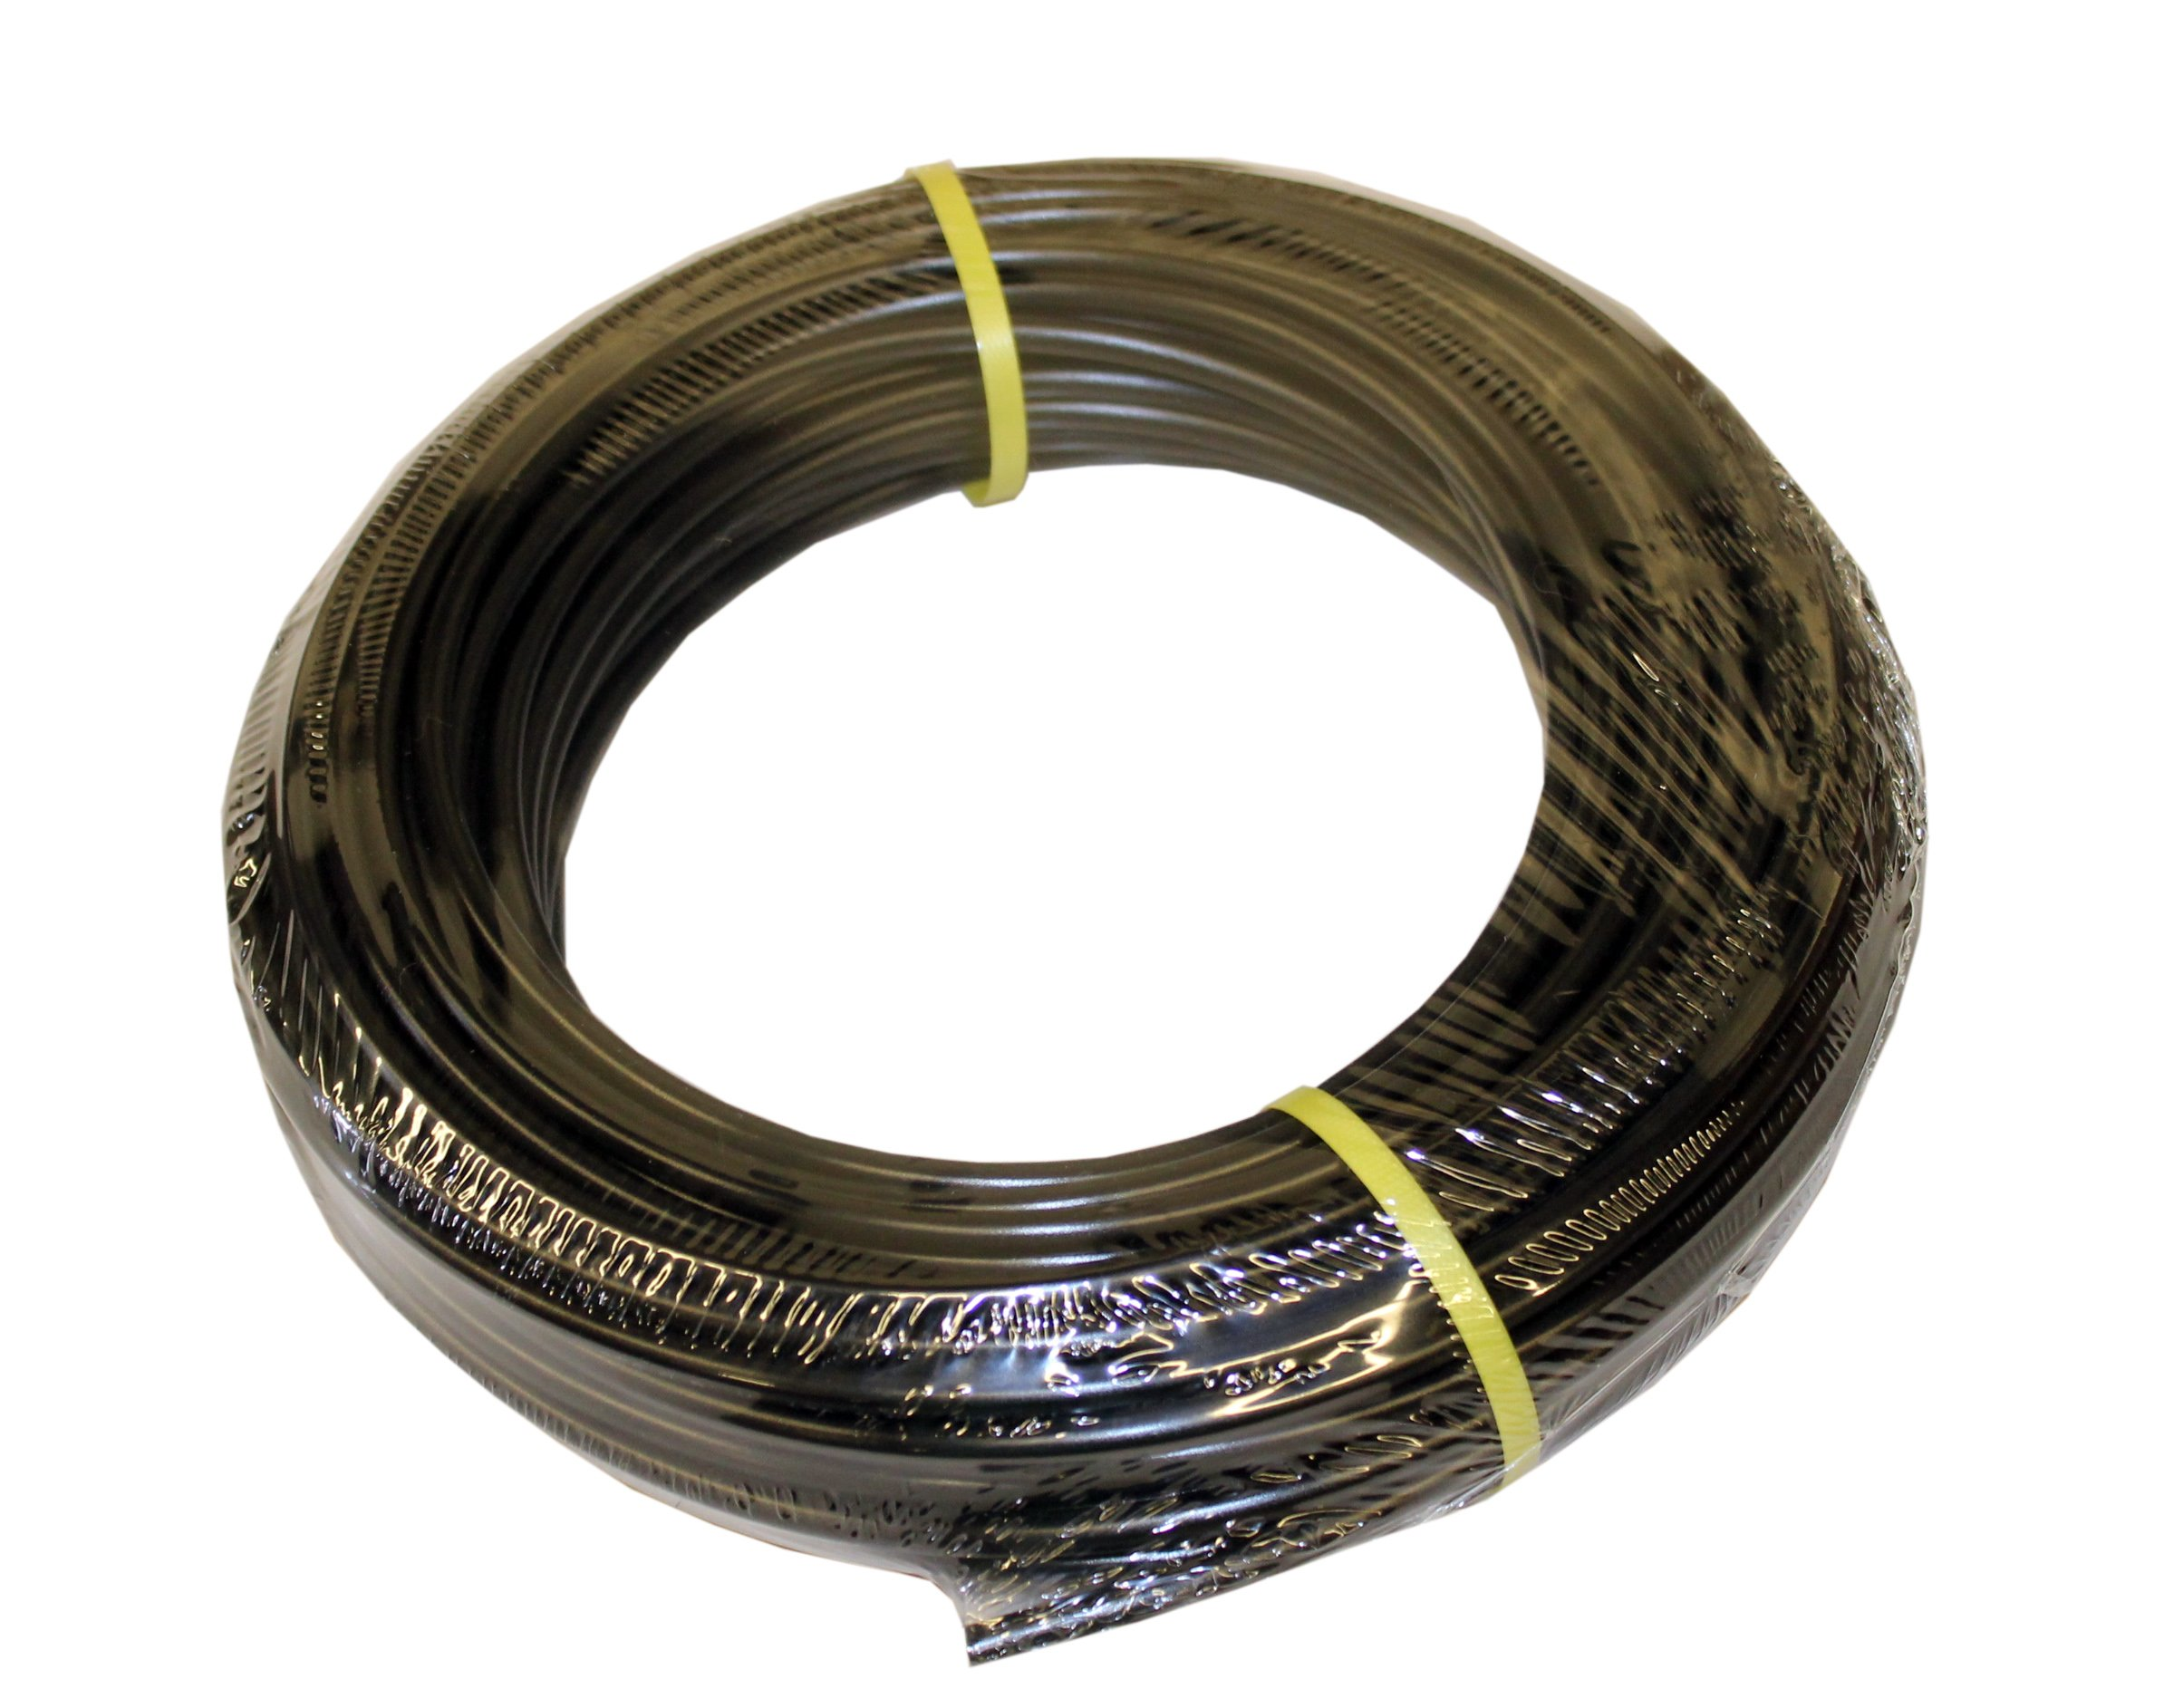 ATP IMBIBE NSF 61 Polyethylene Metric Plastic Tubing, Black, 8 mm ID x 10 mm OD, 100 feet Length